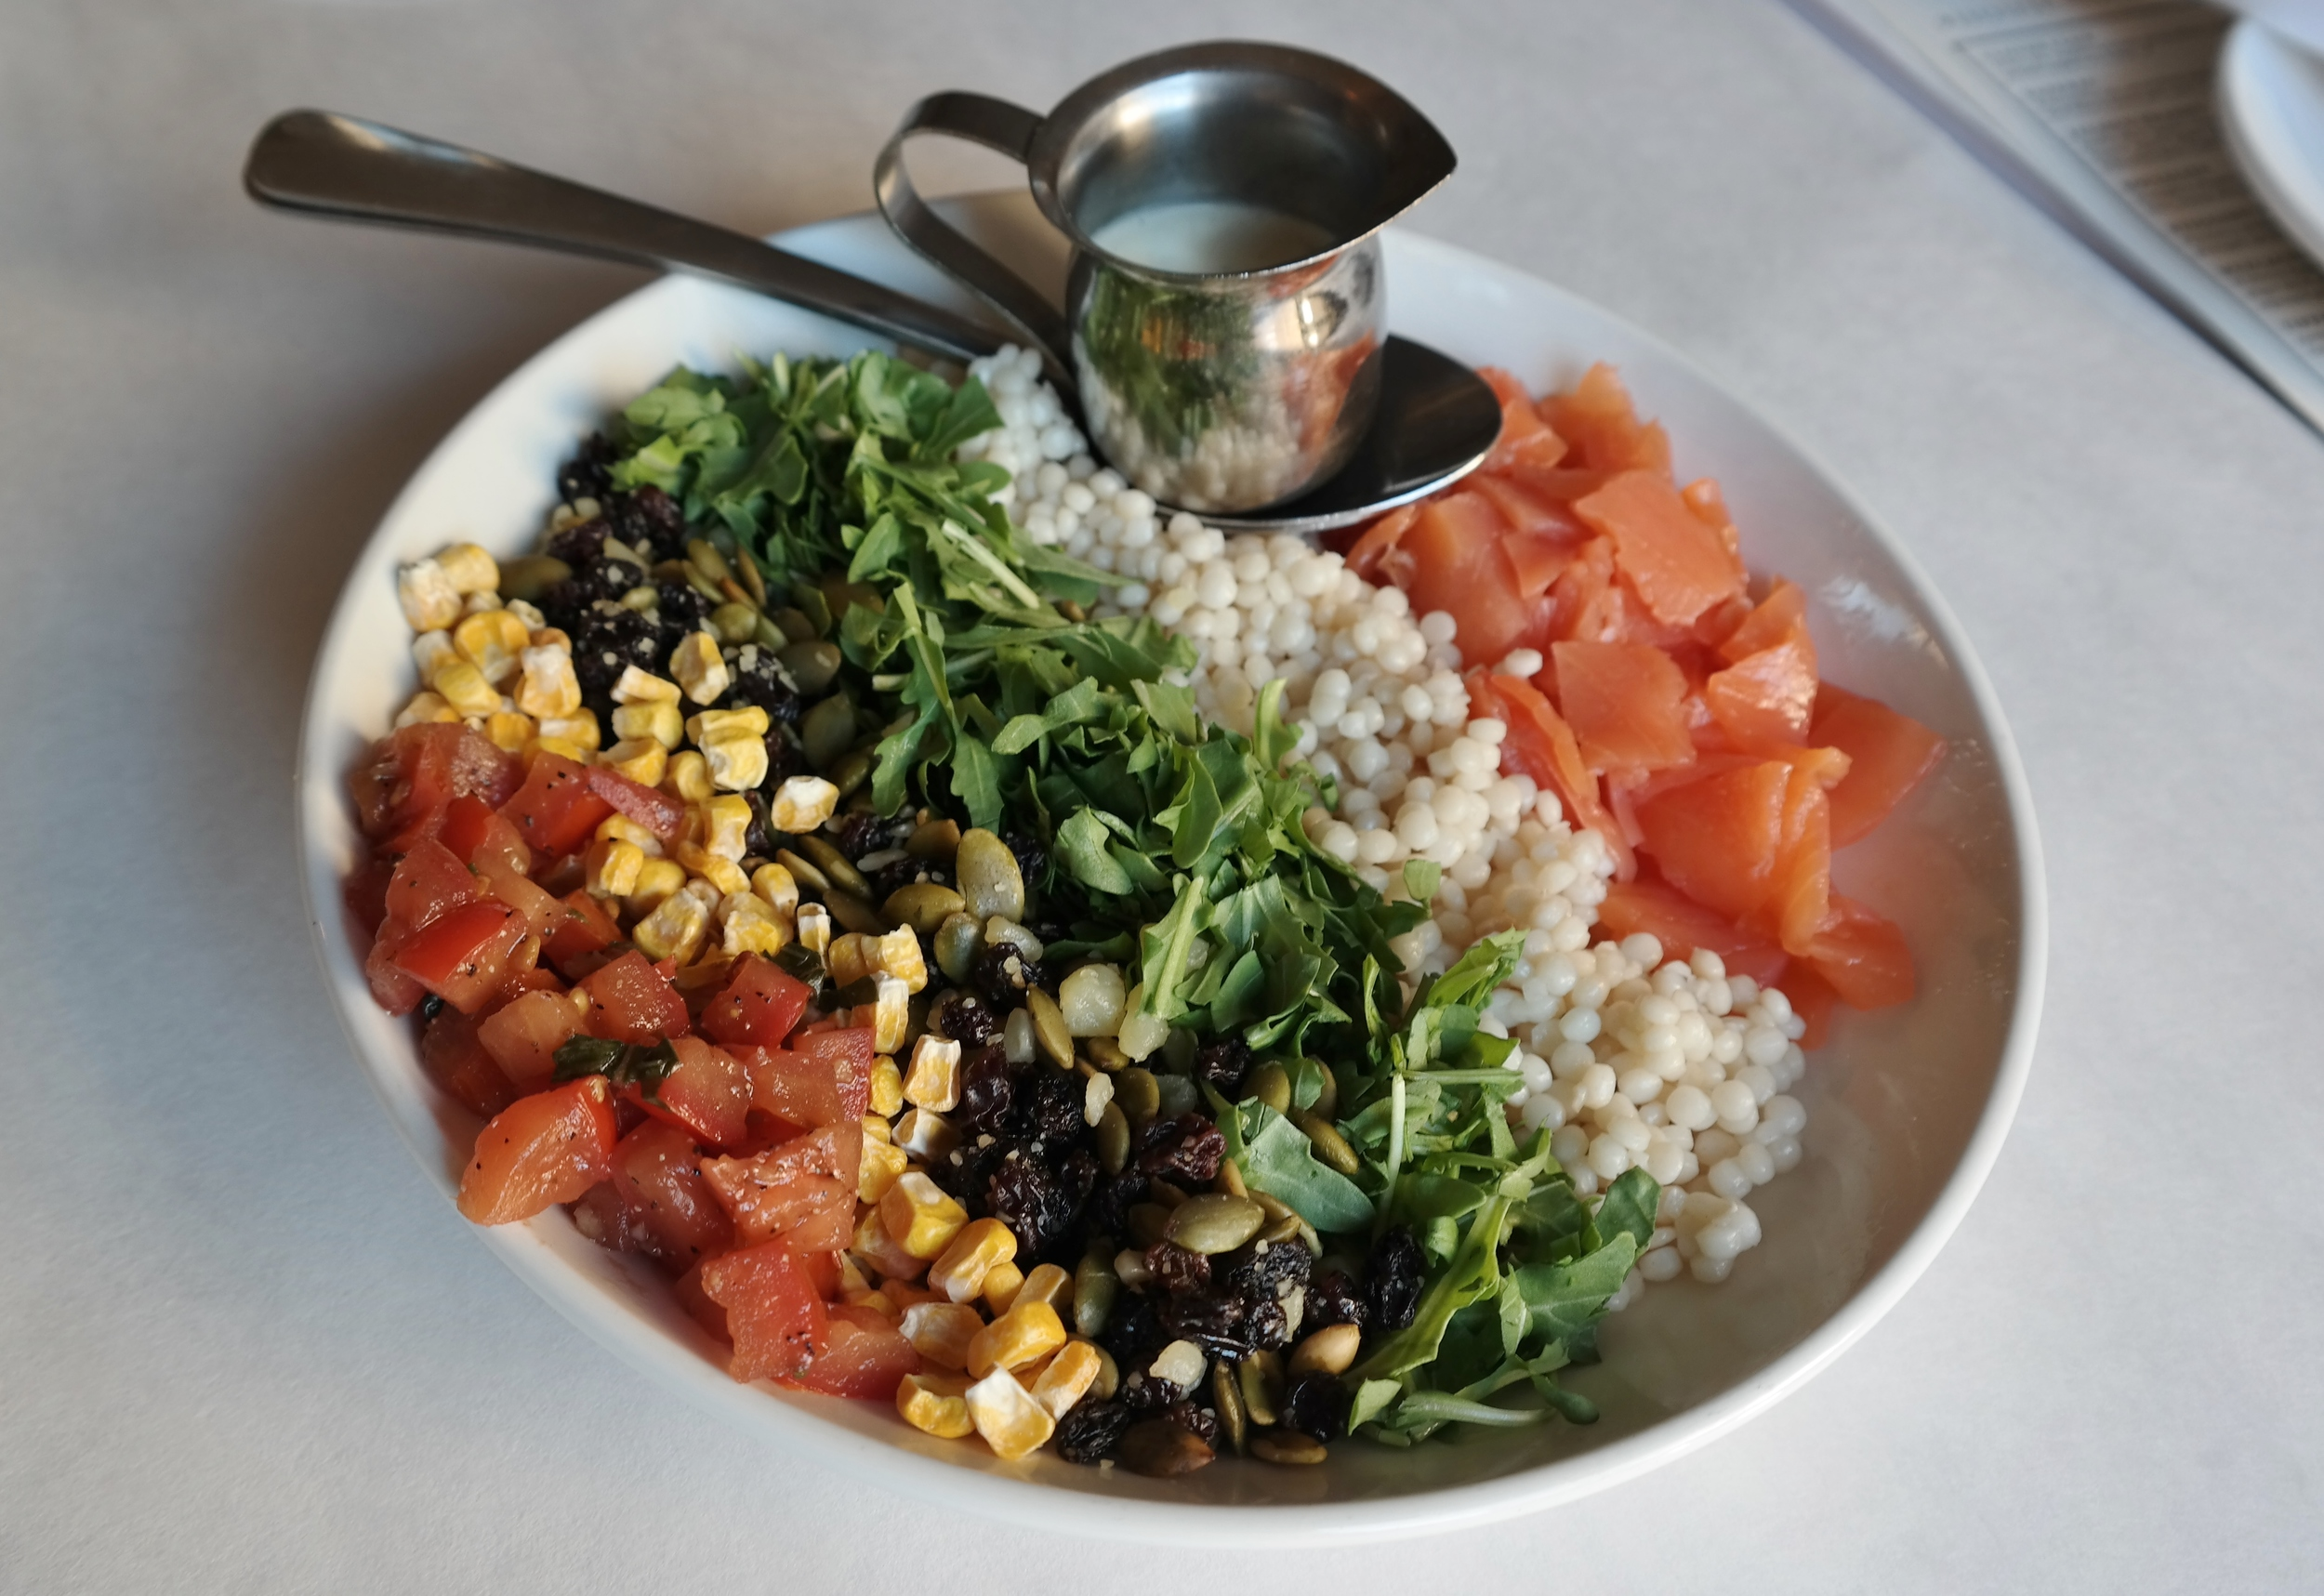 The Original Chopped Salad at Citizen Public House